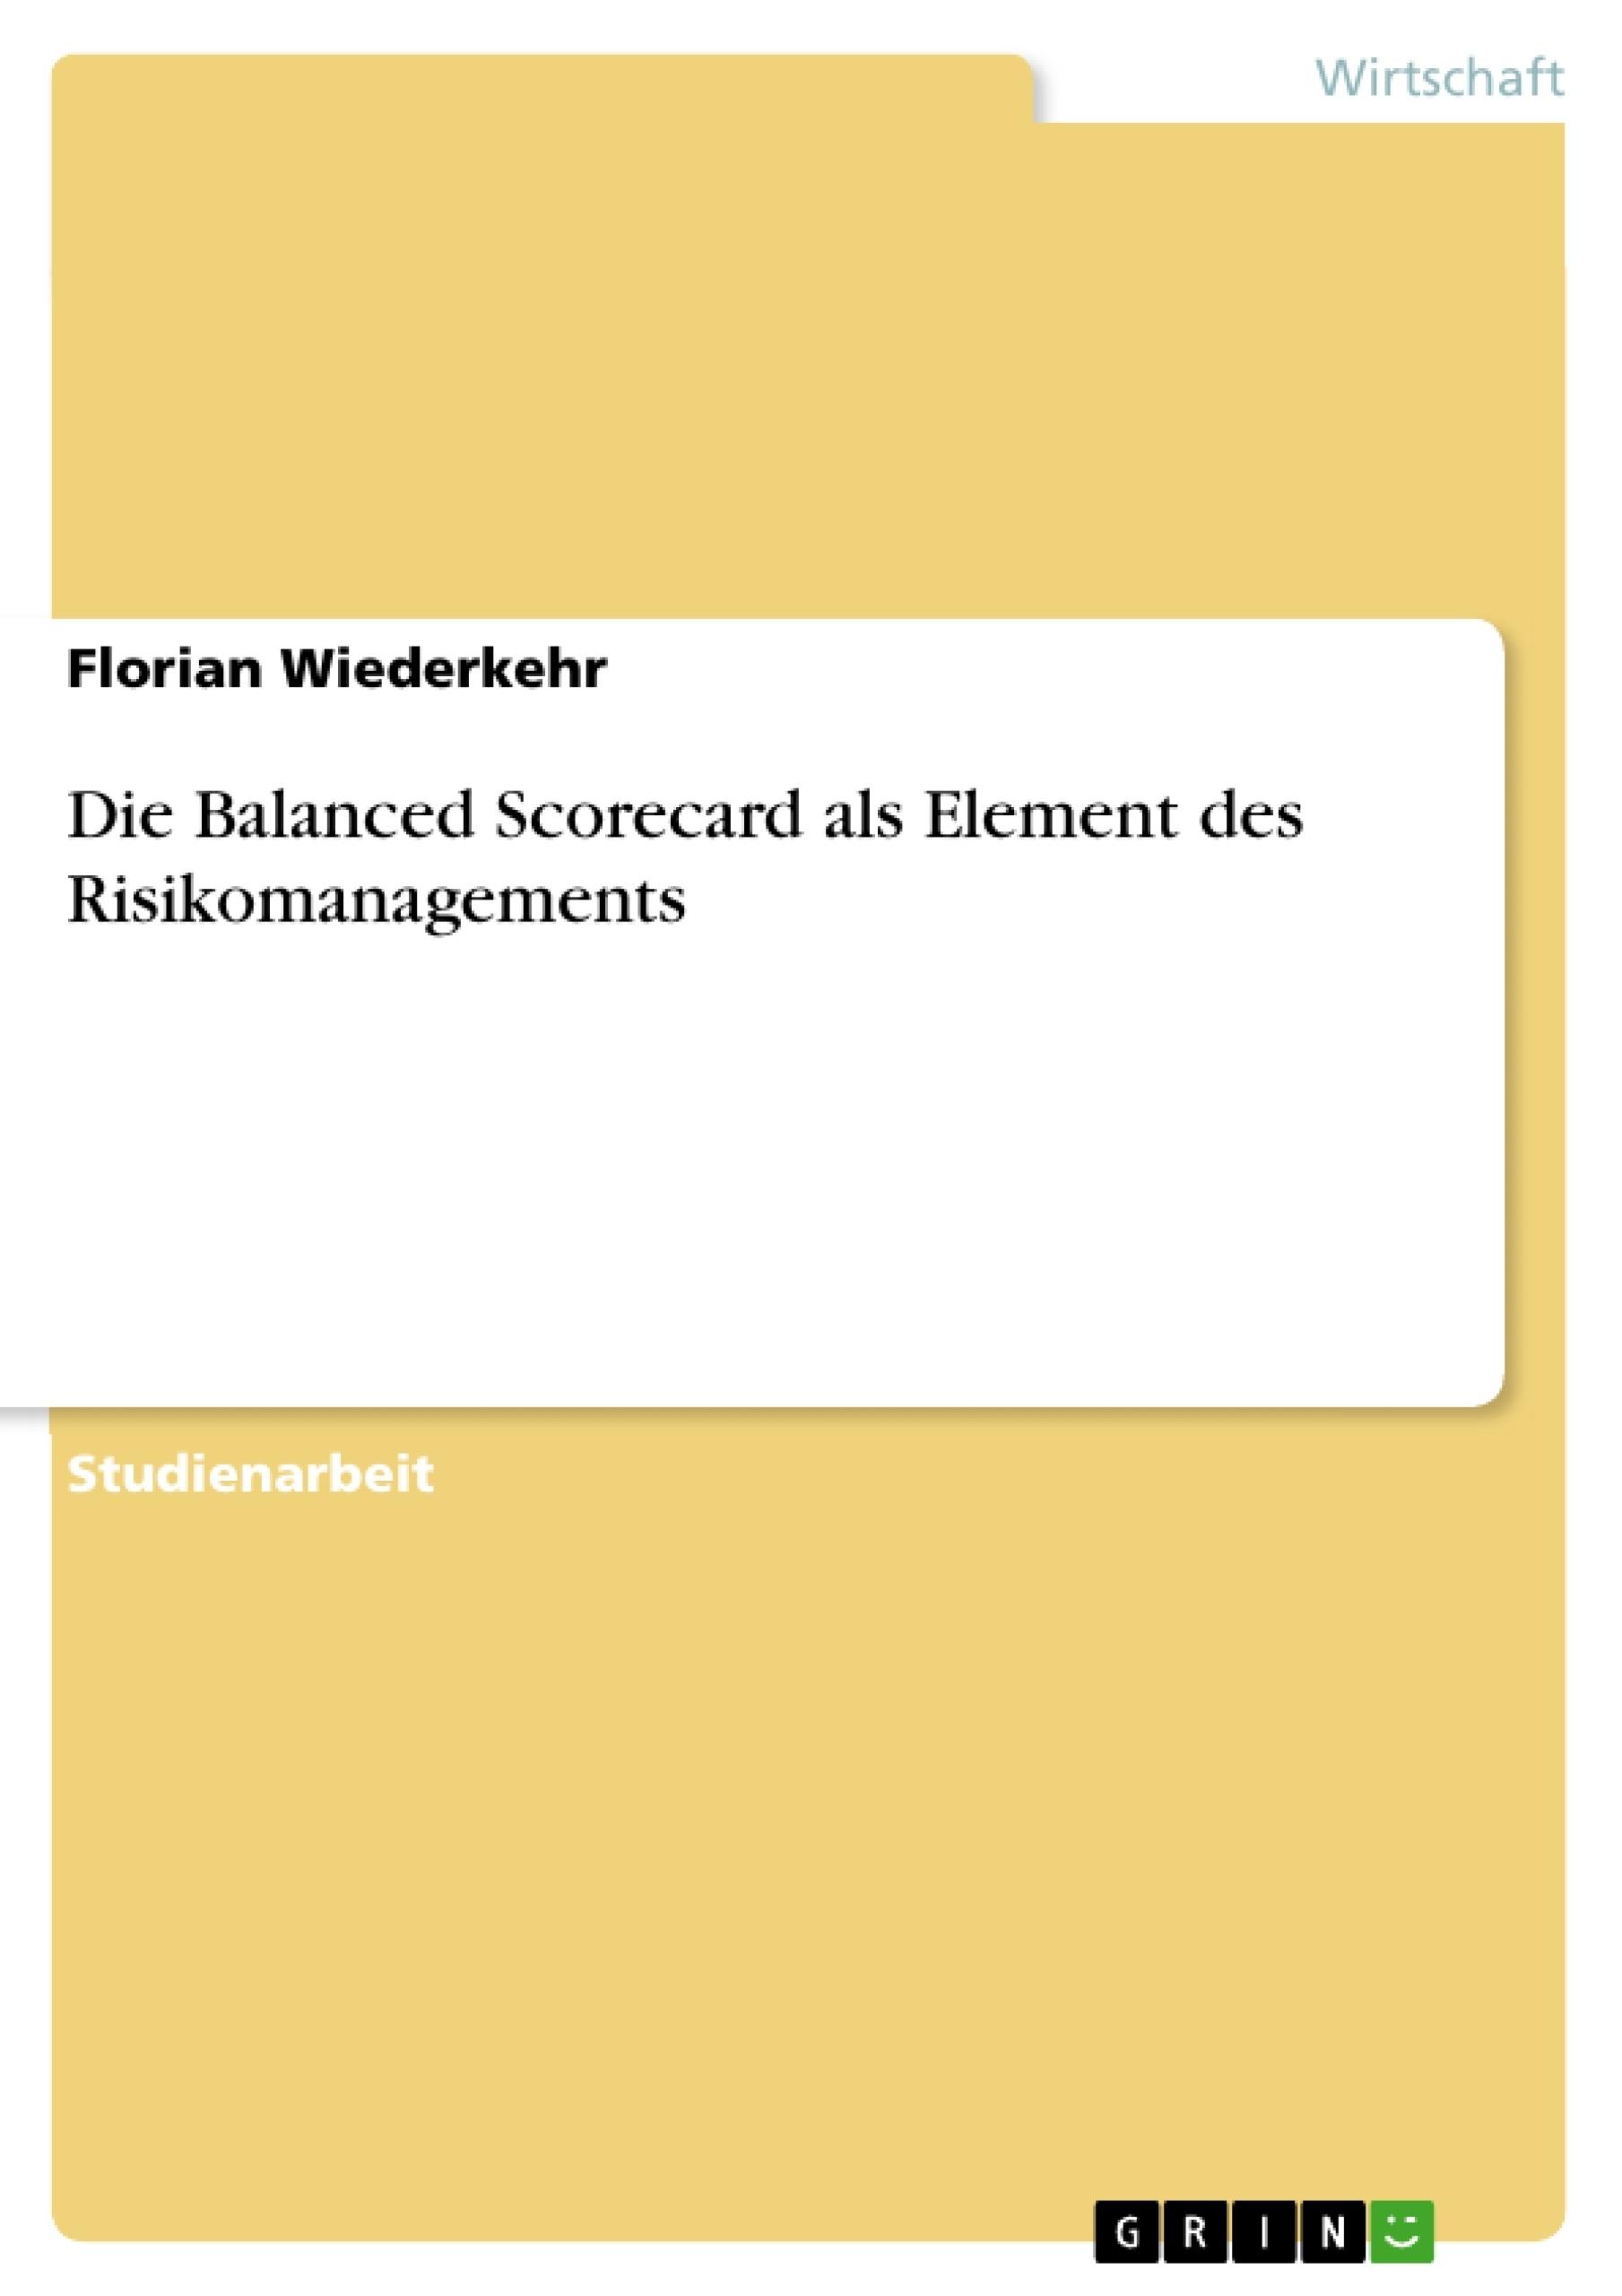 Titel: Die Balanced Scorecard als Element des Risikomanagements